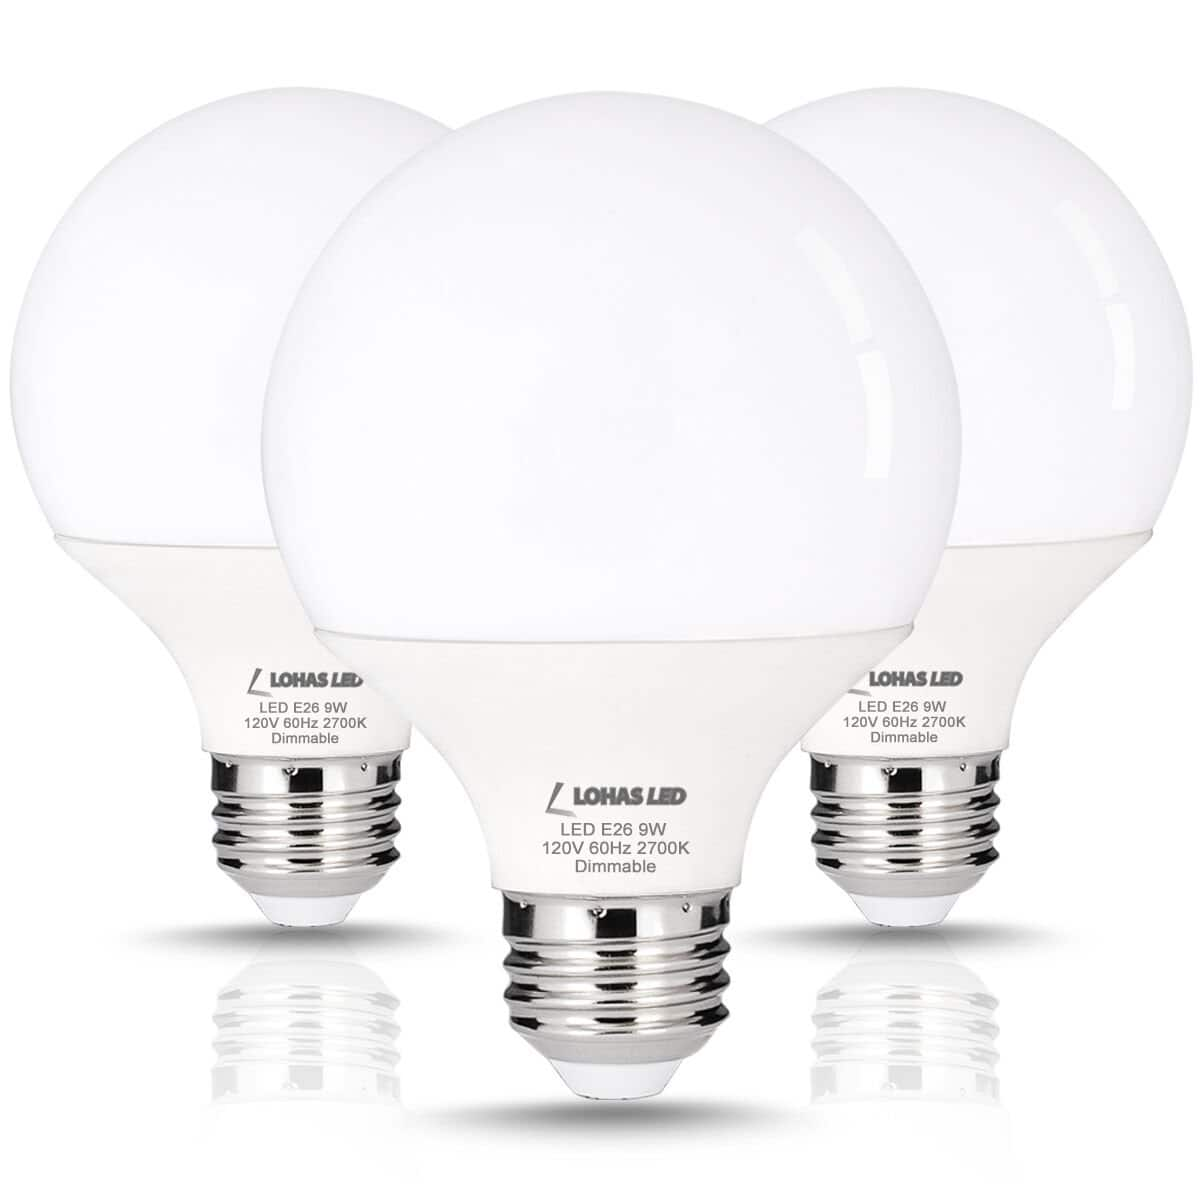 LOHAS 9W G25 LED Globe Light Bulb Warm White 2700K Dimmable (3 Pack) for $11.99 @Amazon